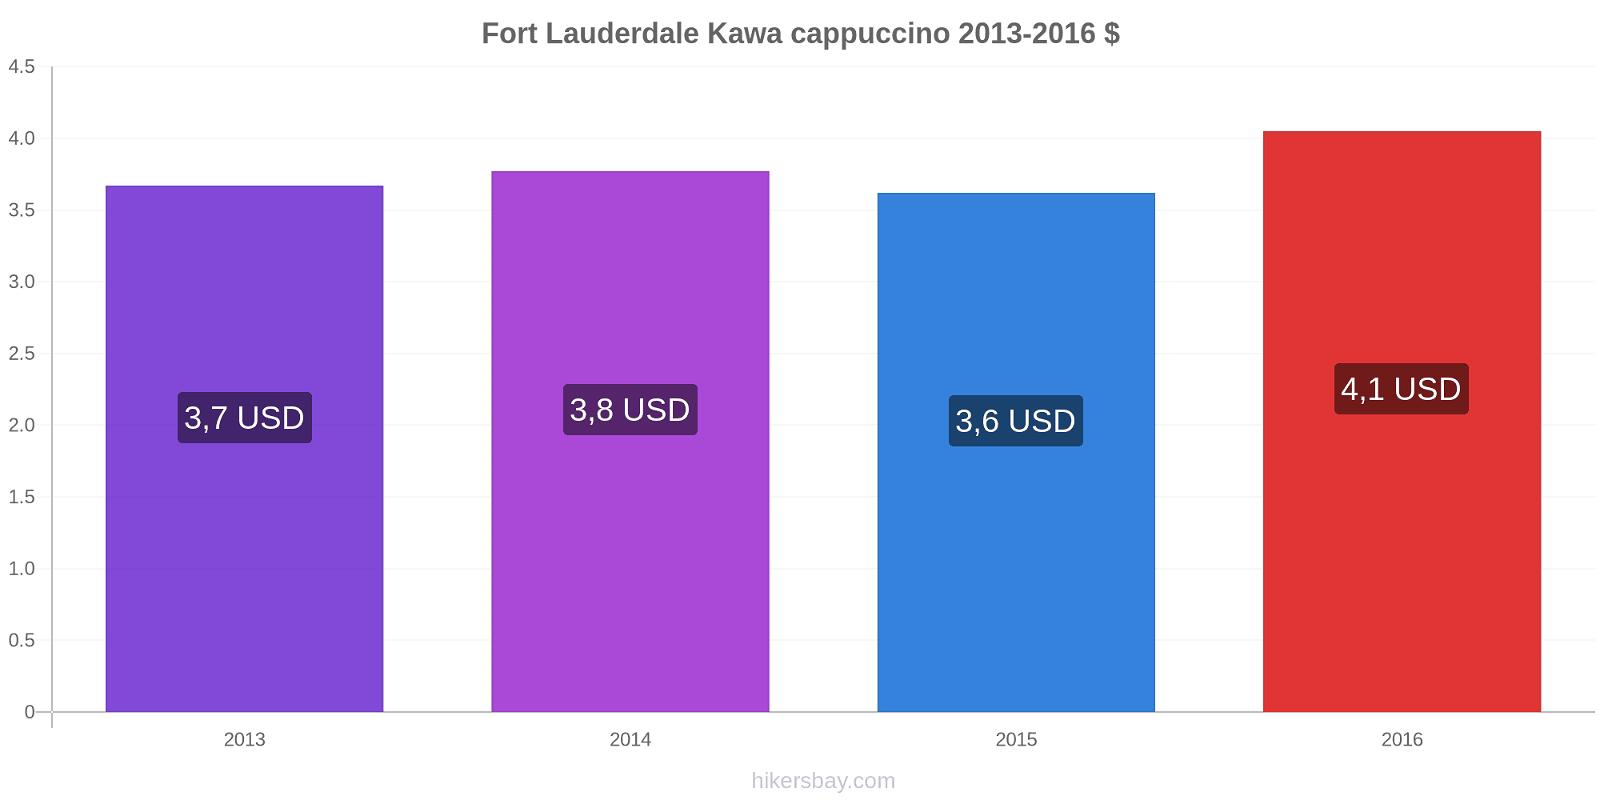 Fort Lauderdale zmiany cen Kawa cappuccino hikersbay.com